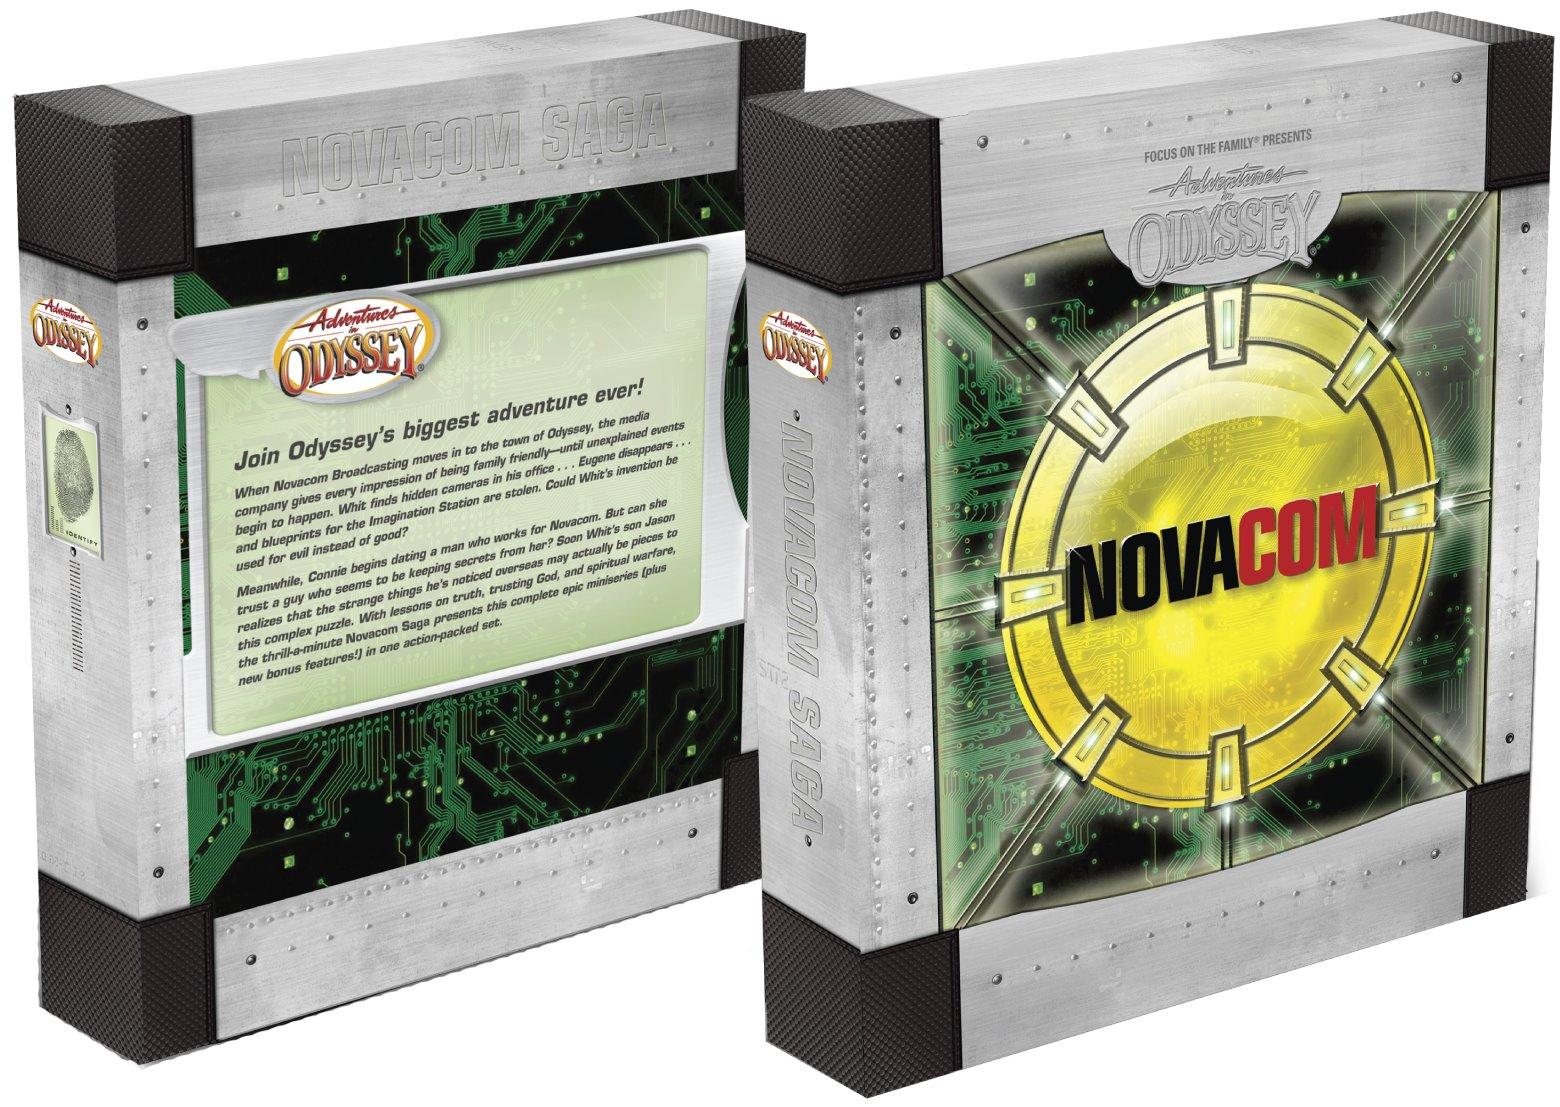 [Adventures+in+Odyssey+Novacom+Saga+-+3D+image+300dpi.jpg]